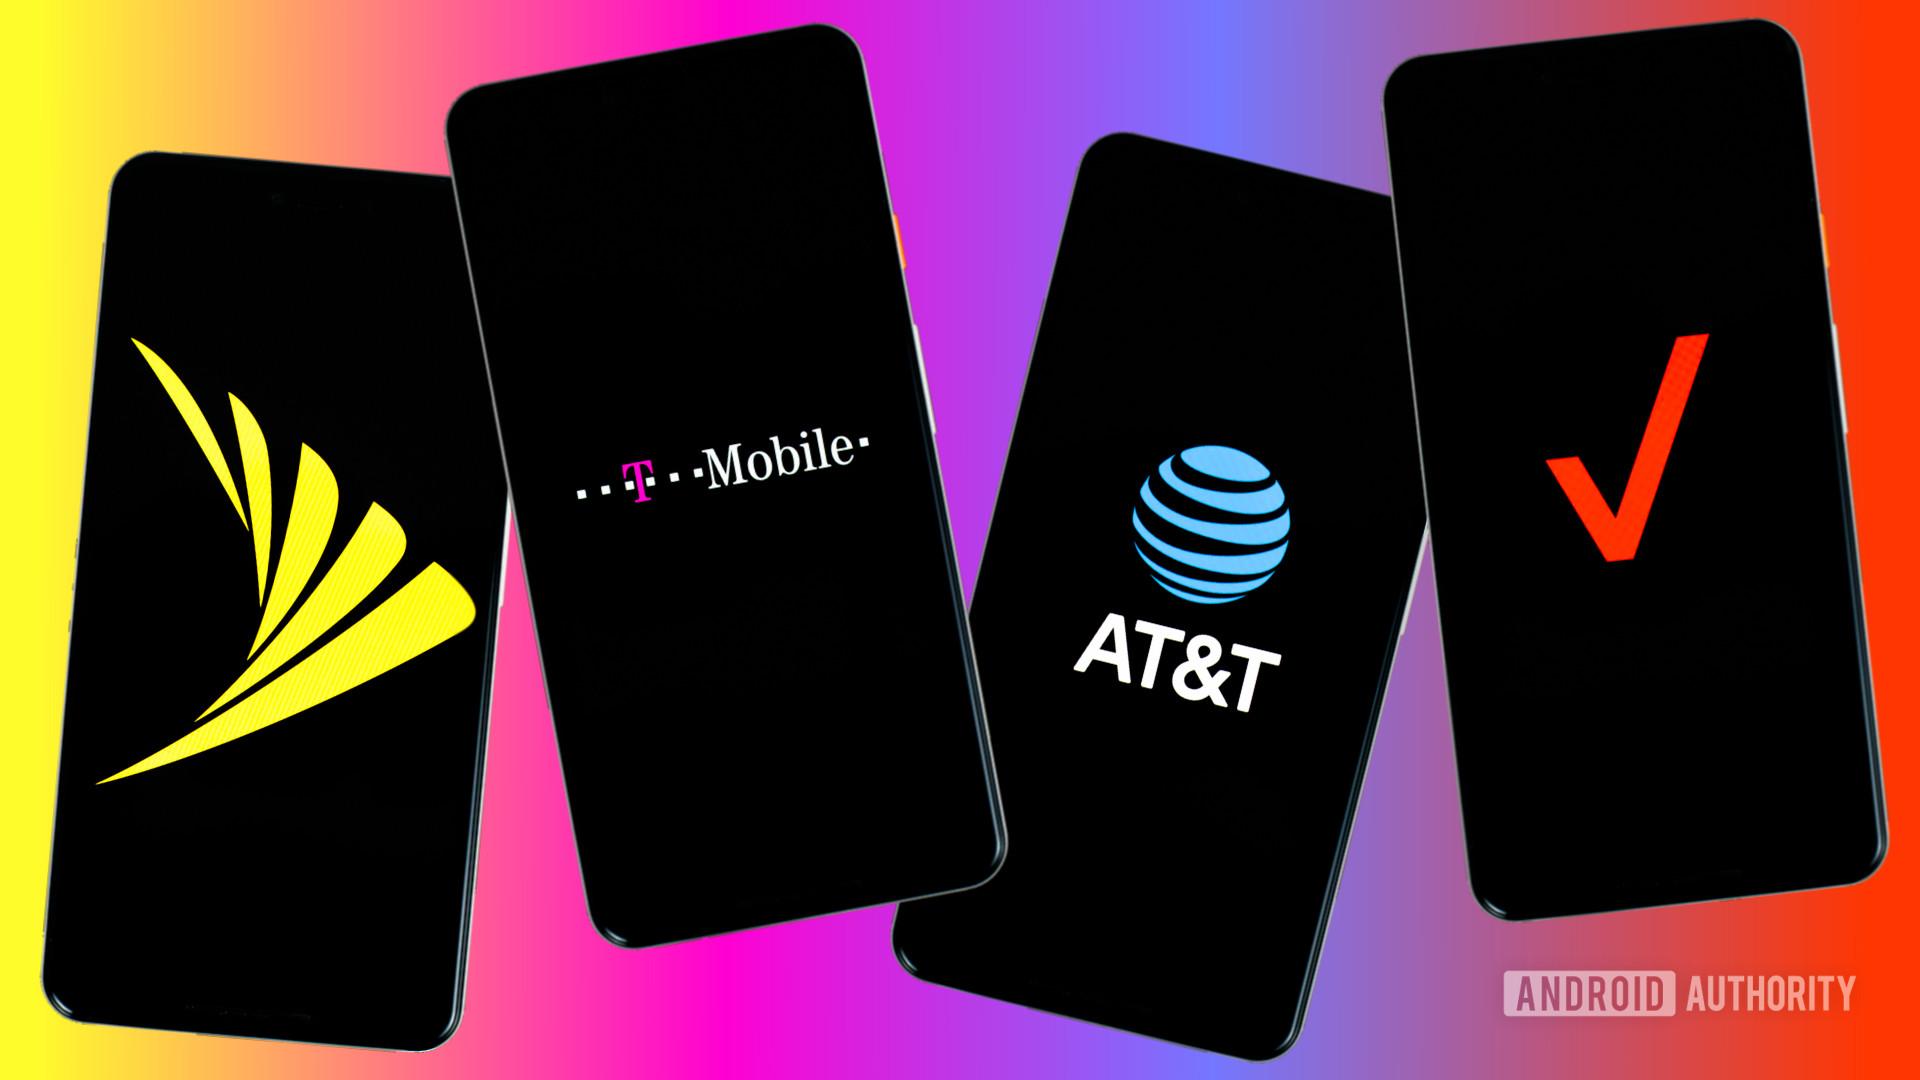 Sprint Verizon T Mobile and Verizon carriers stock photo